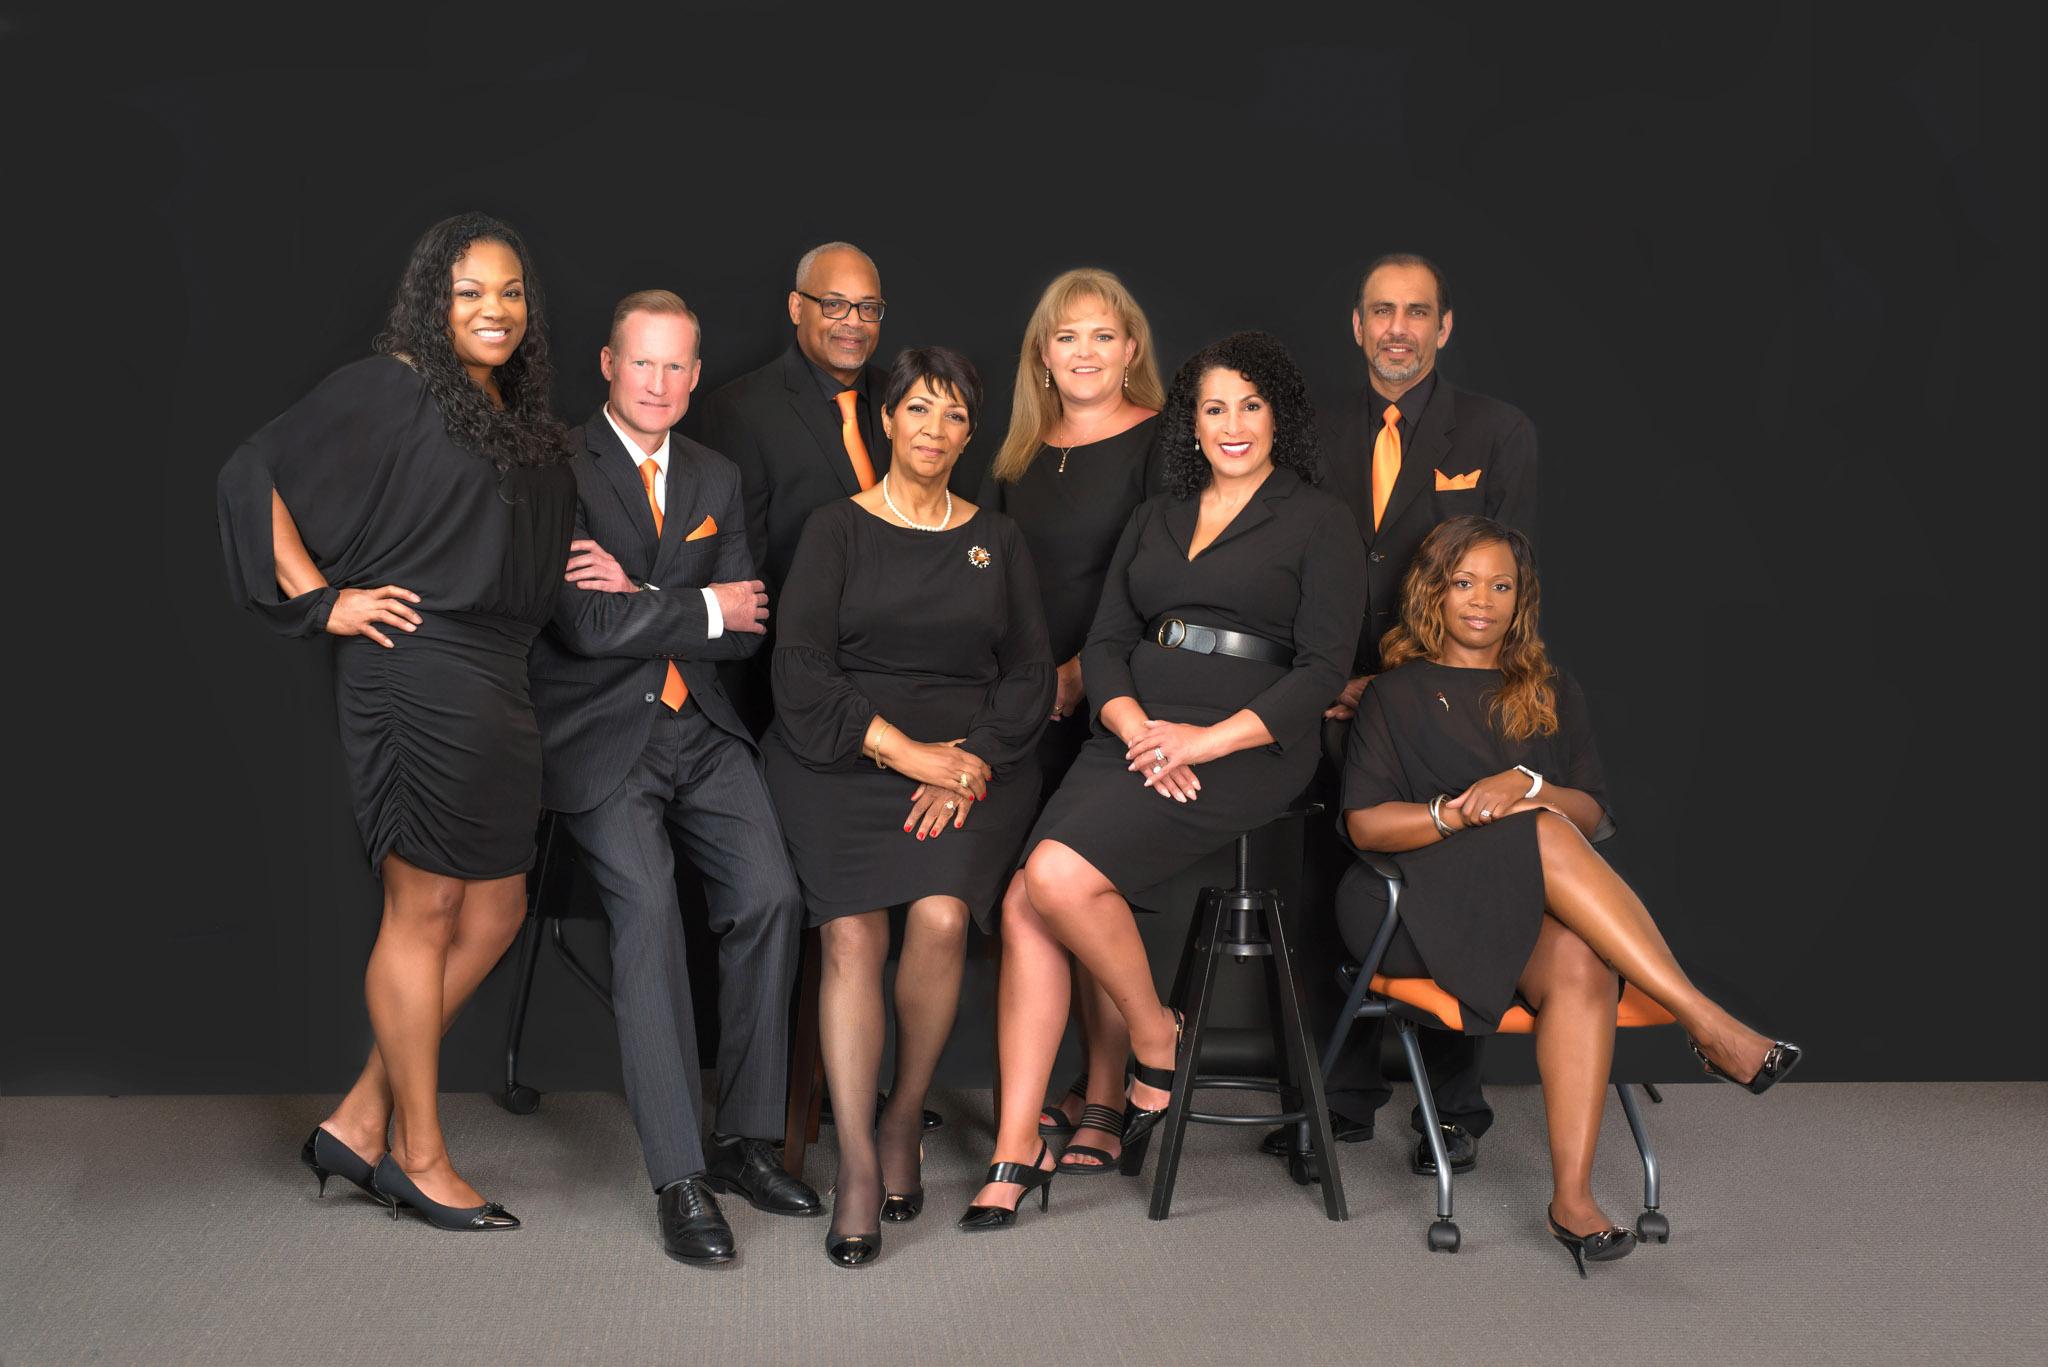 Executive Team Group Portraits